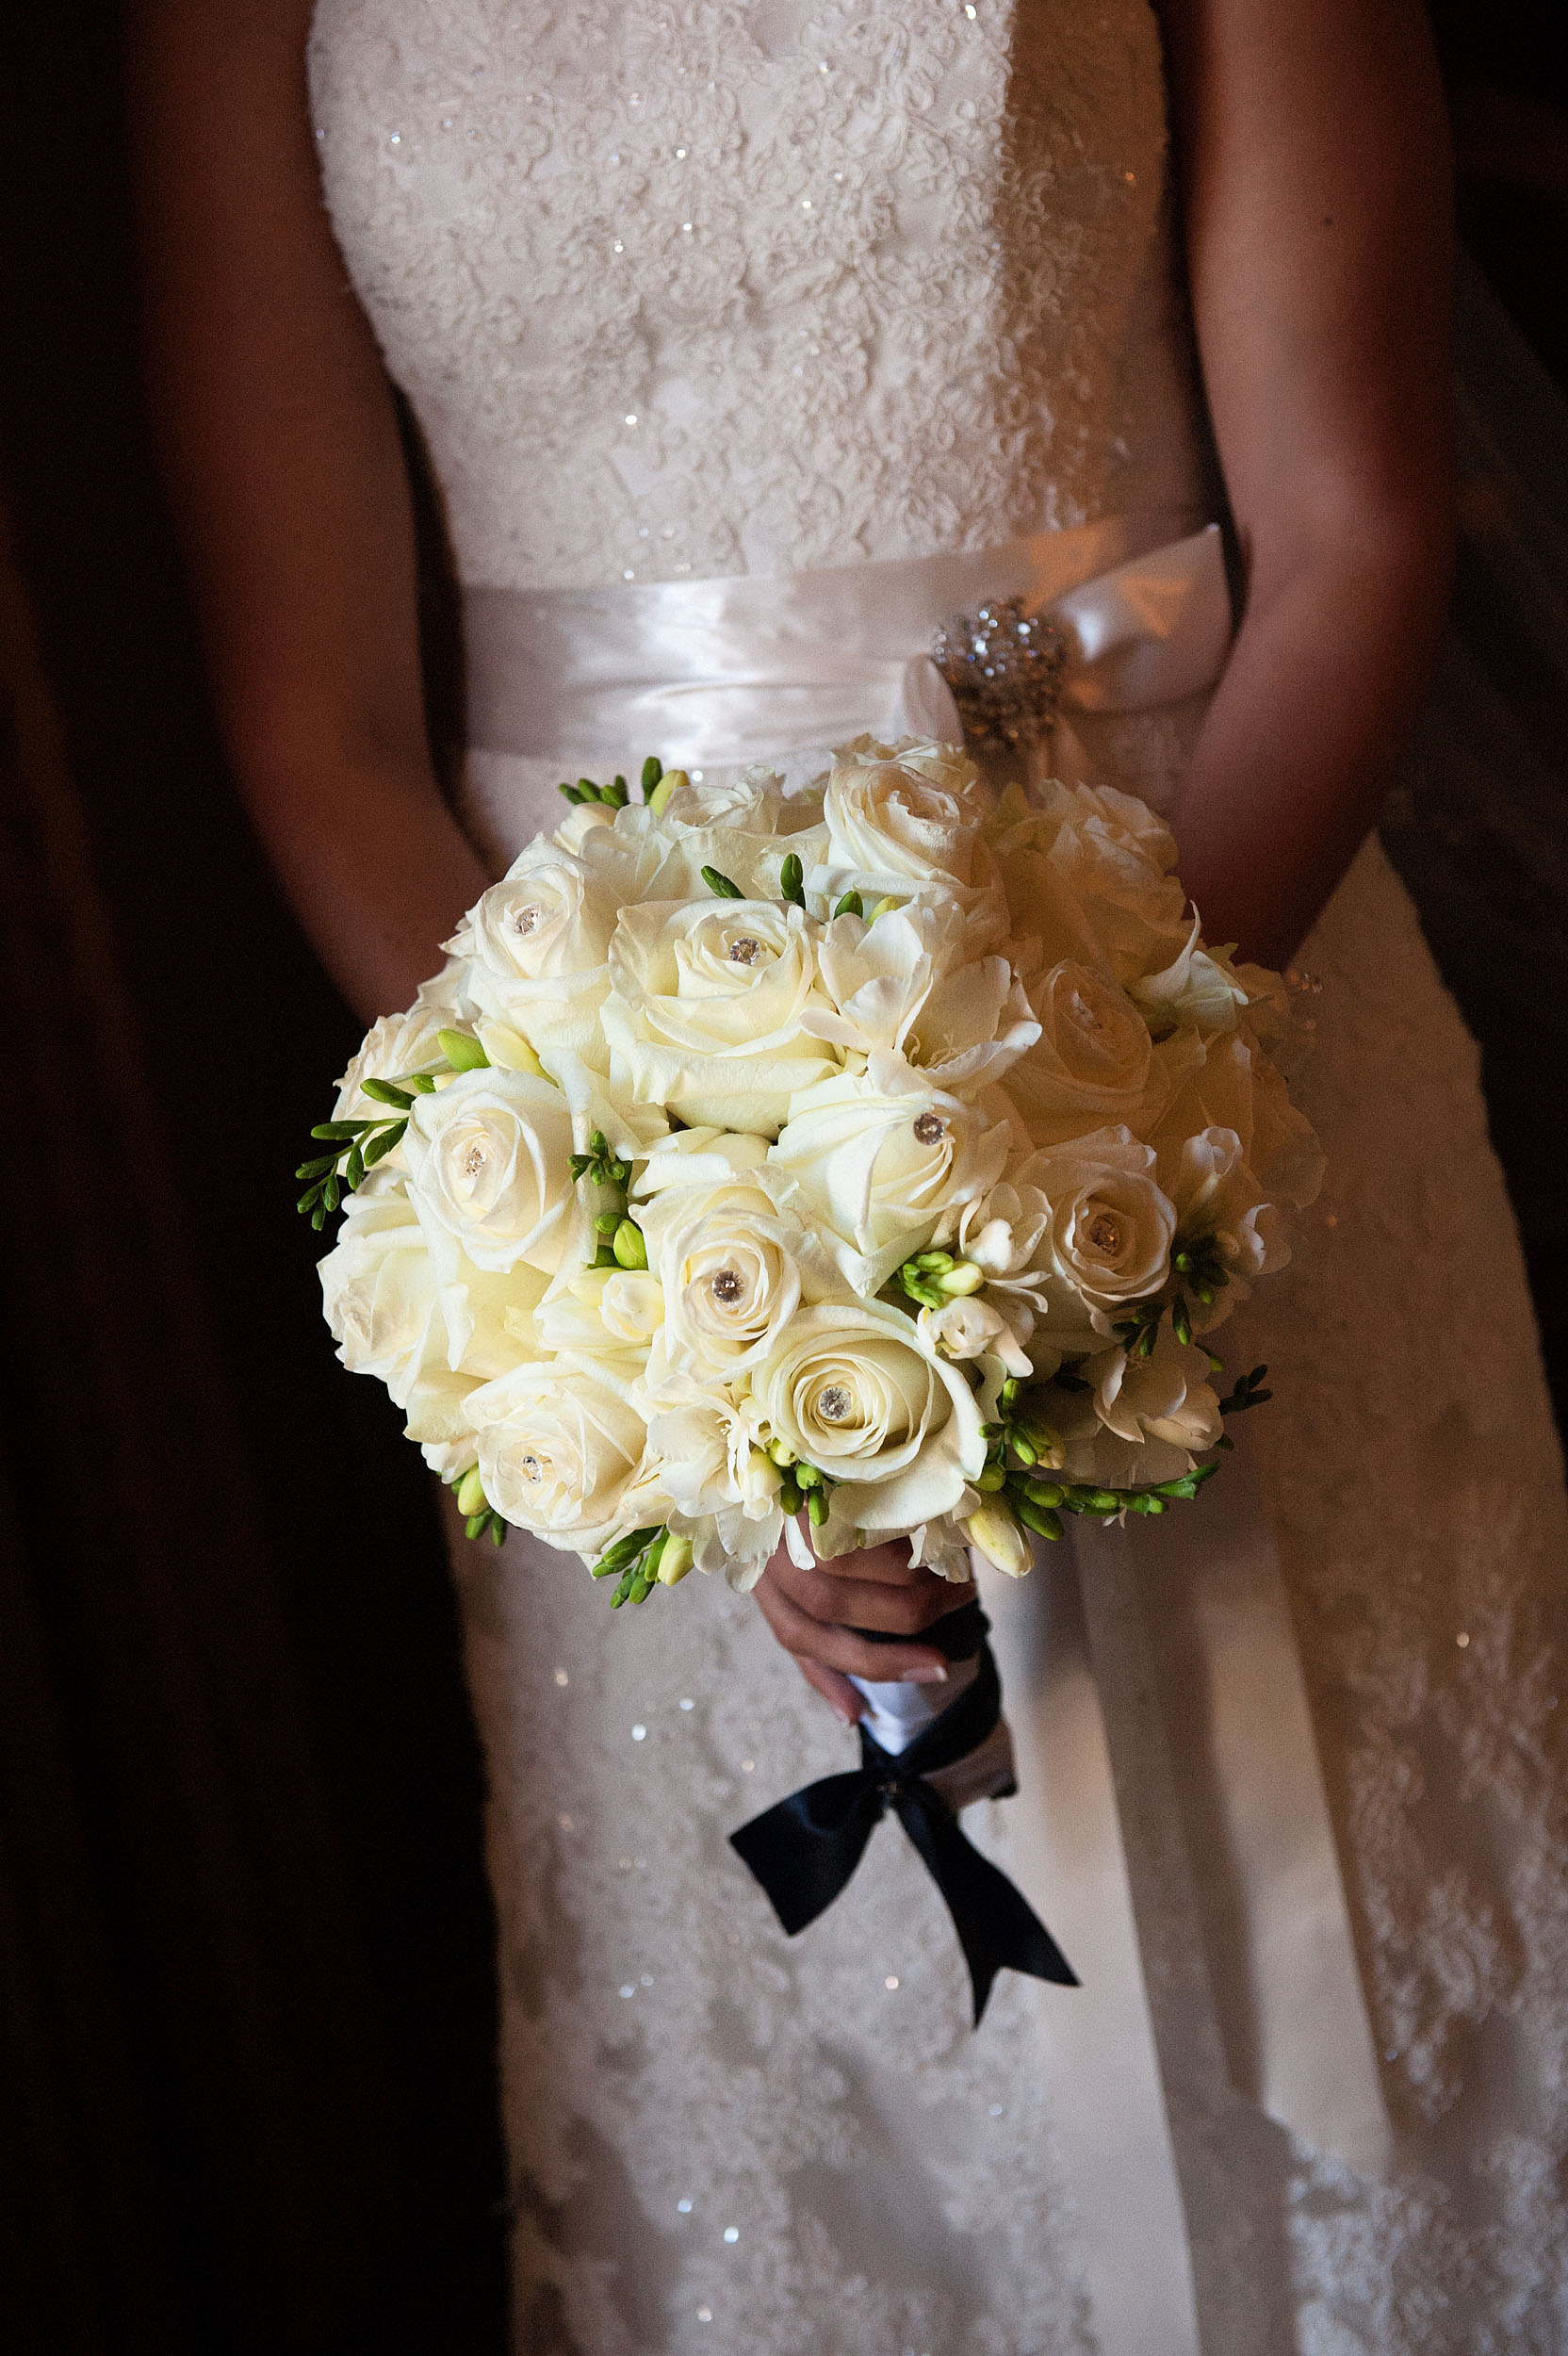 Bride in wedding dress holding bouquet.